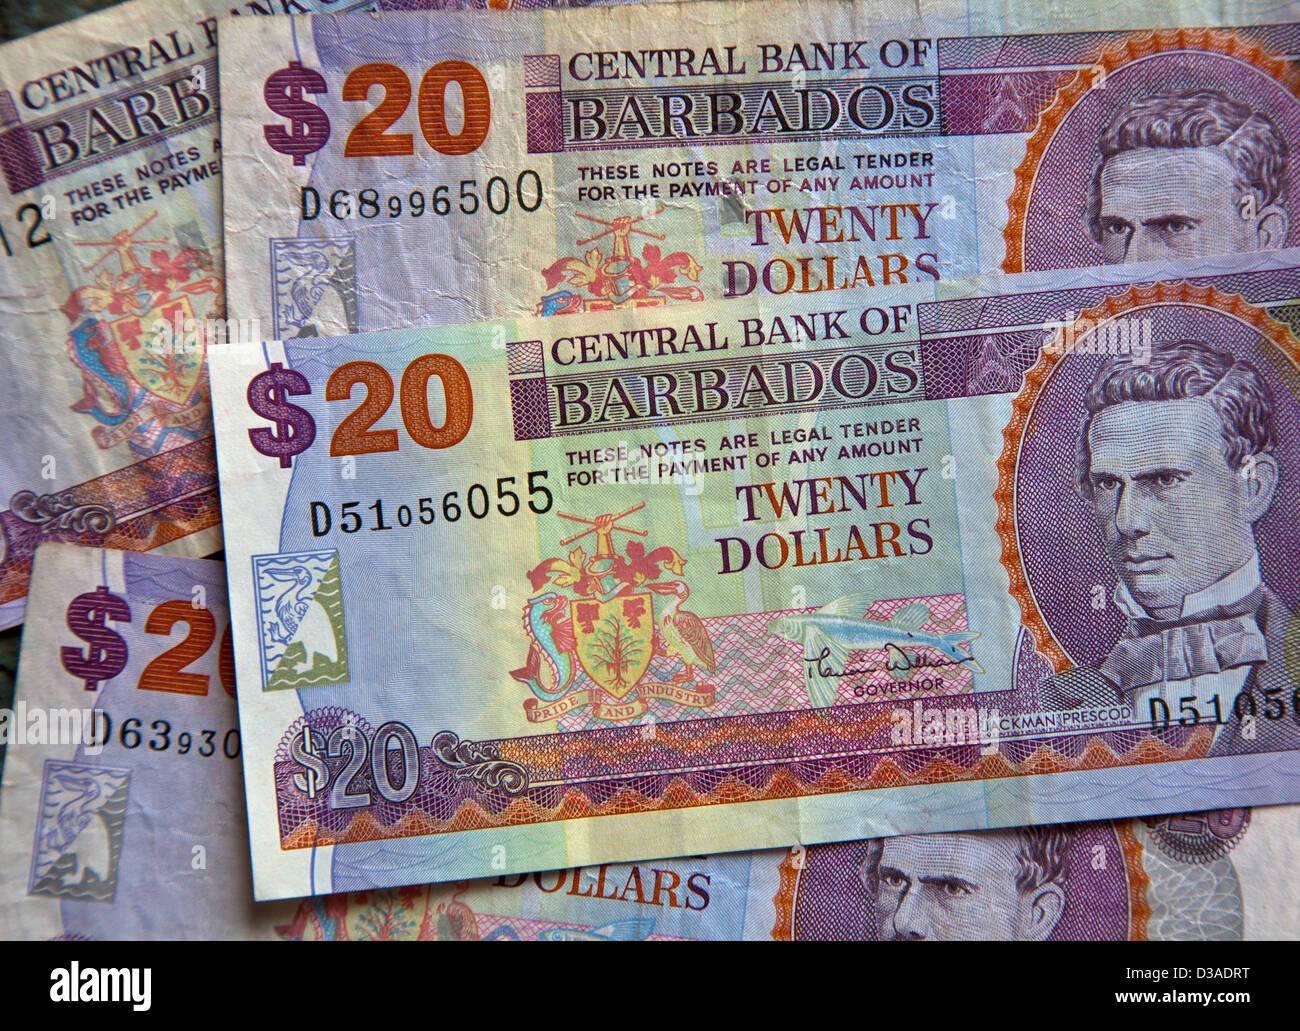 Barbados dollar banknotes - Stock Image